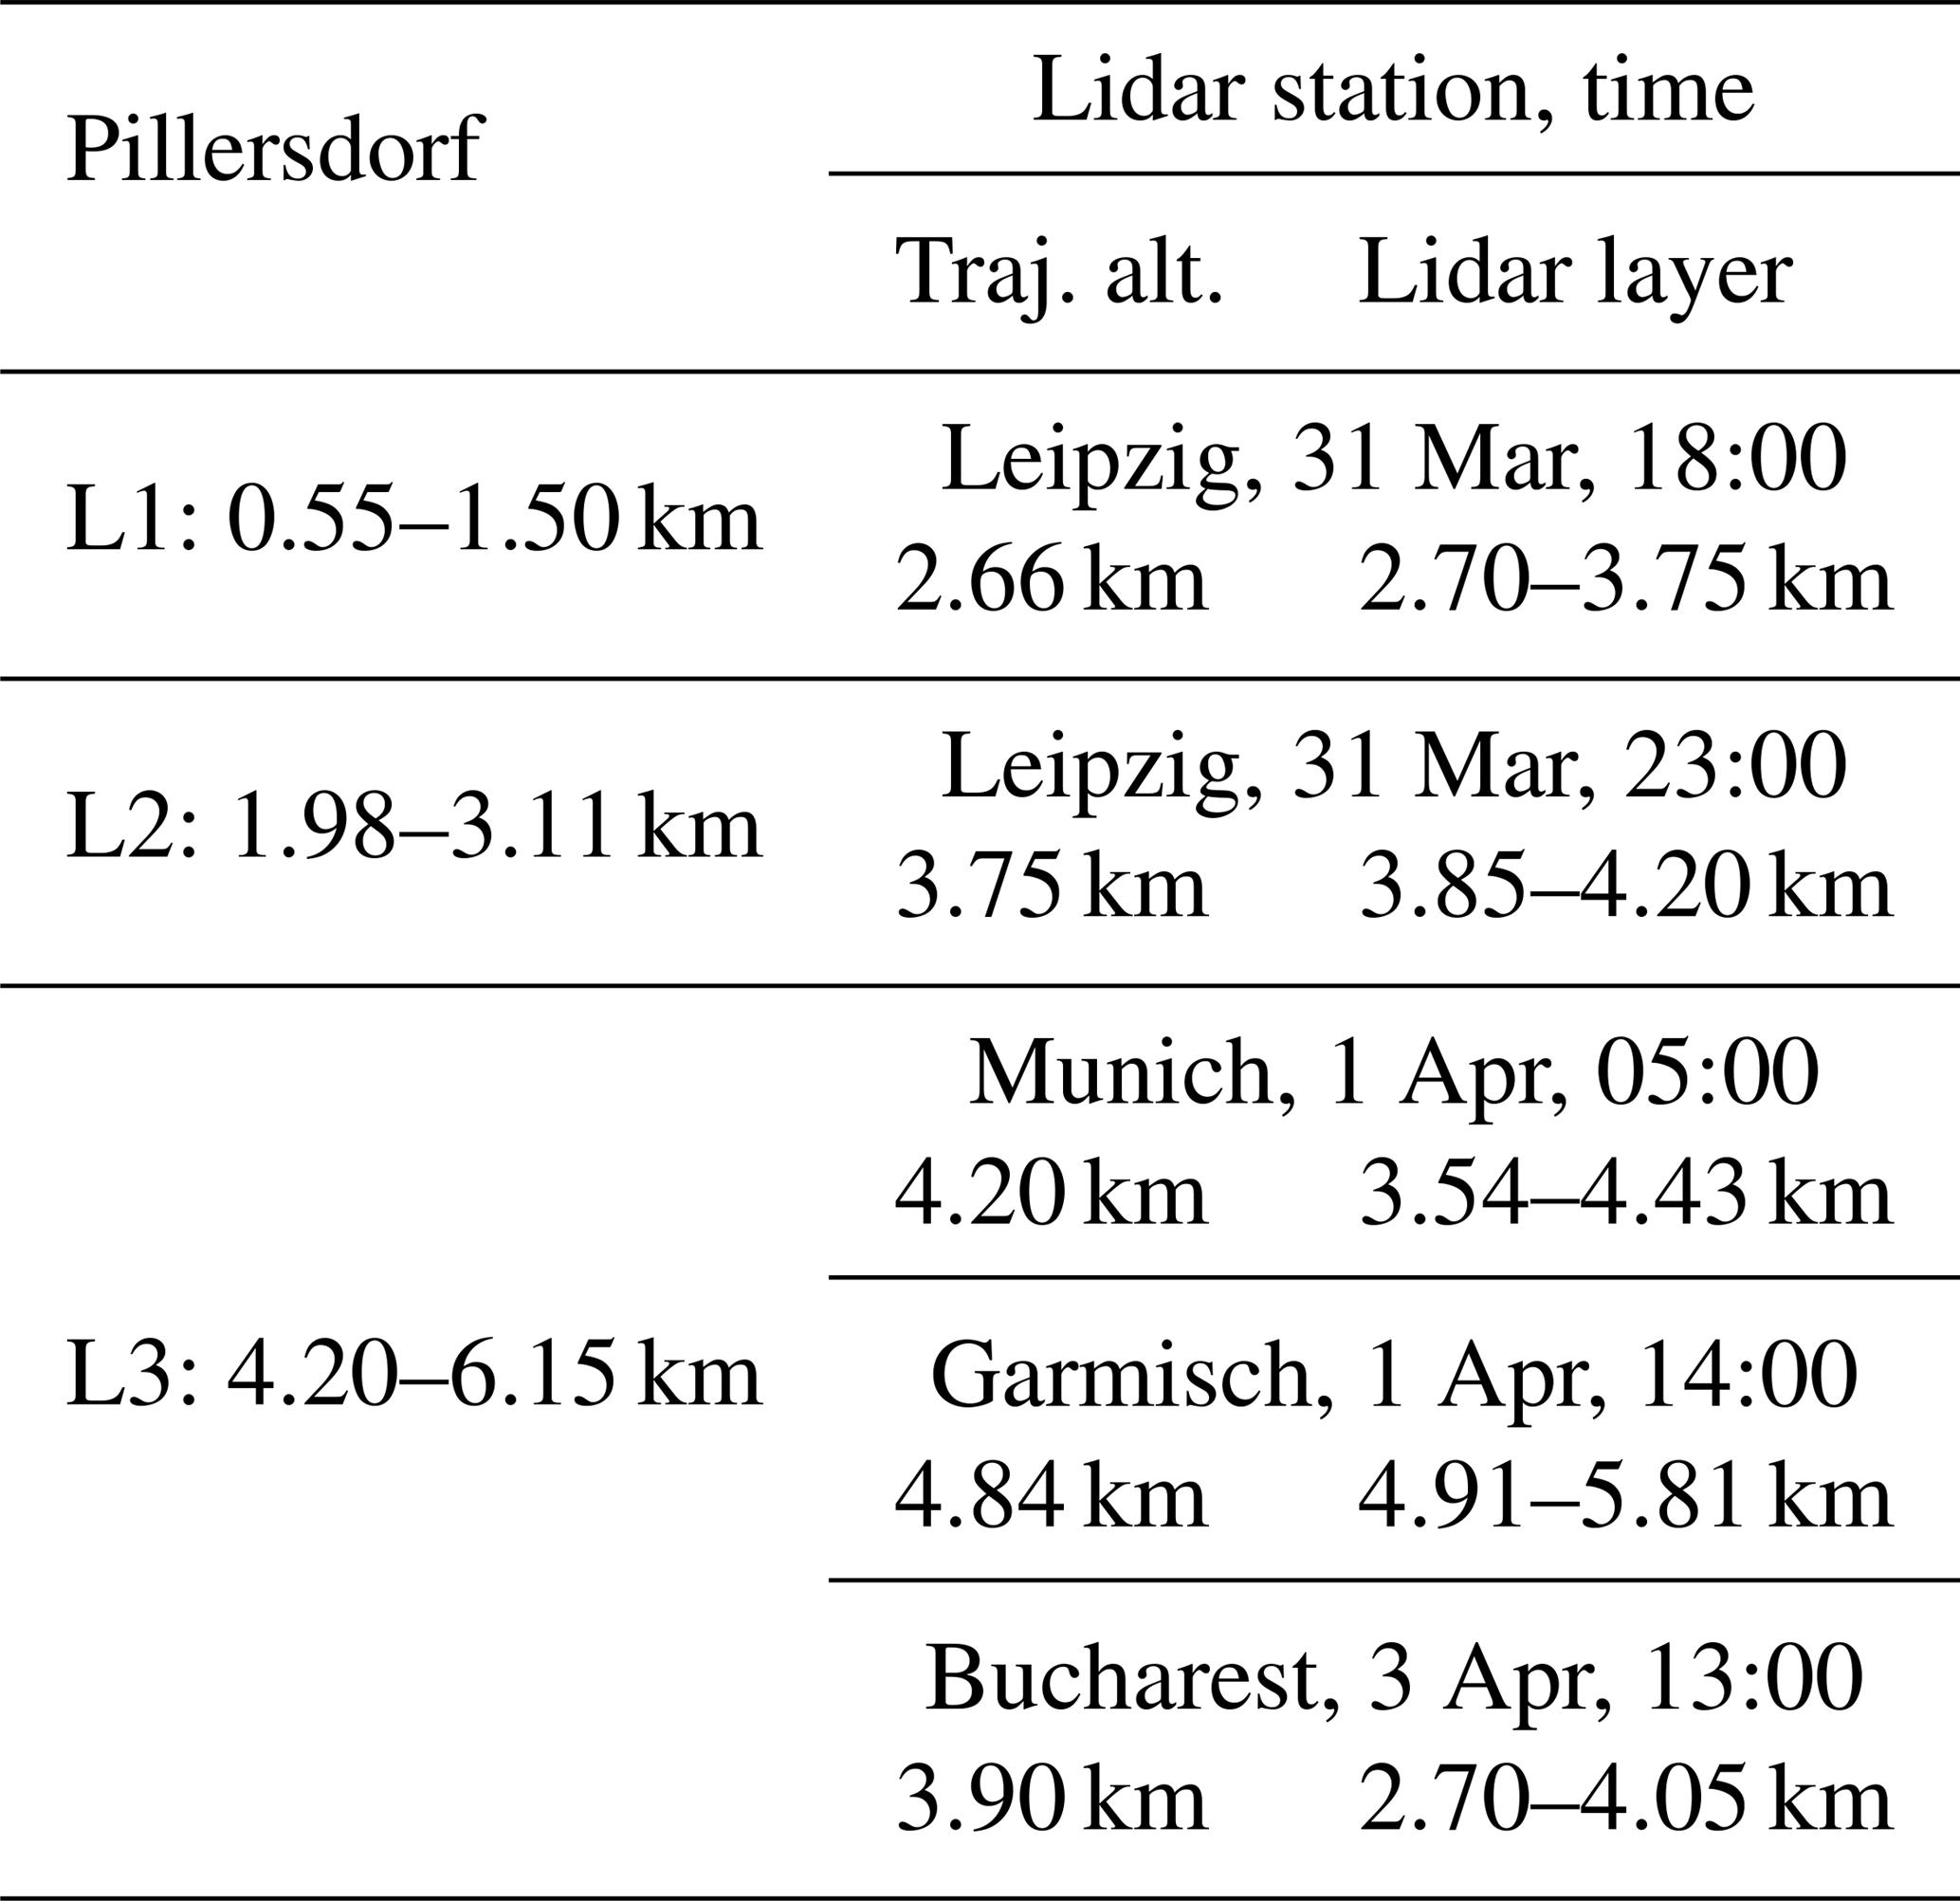 ACP - Analysis of sulfate aerosols over Austria: a case study